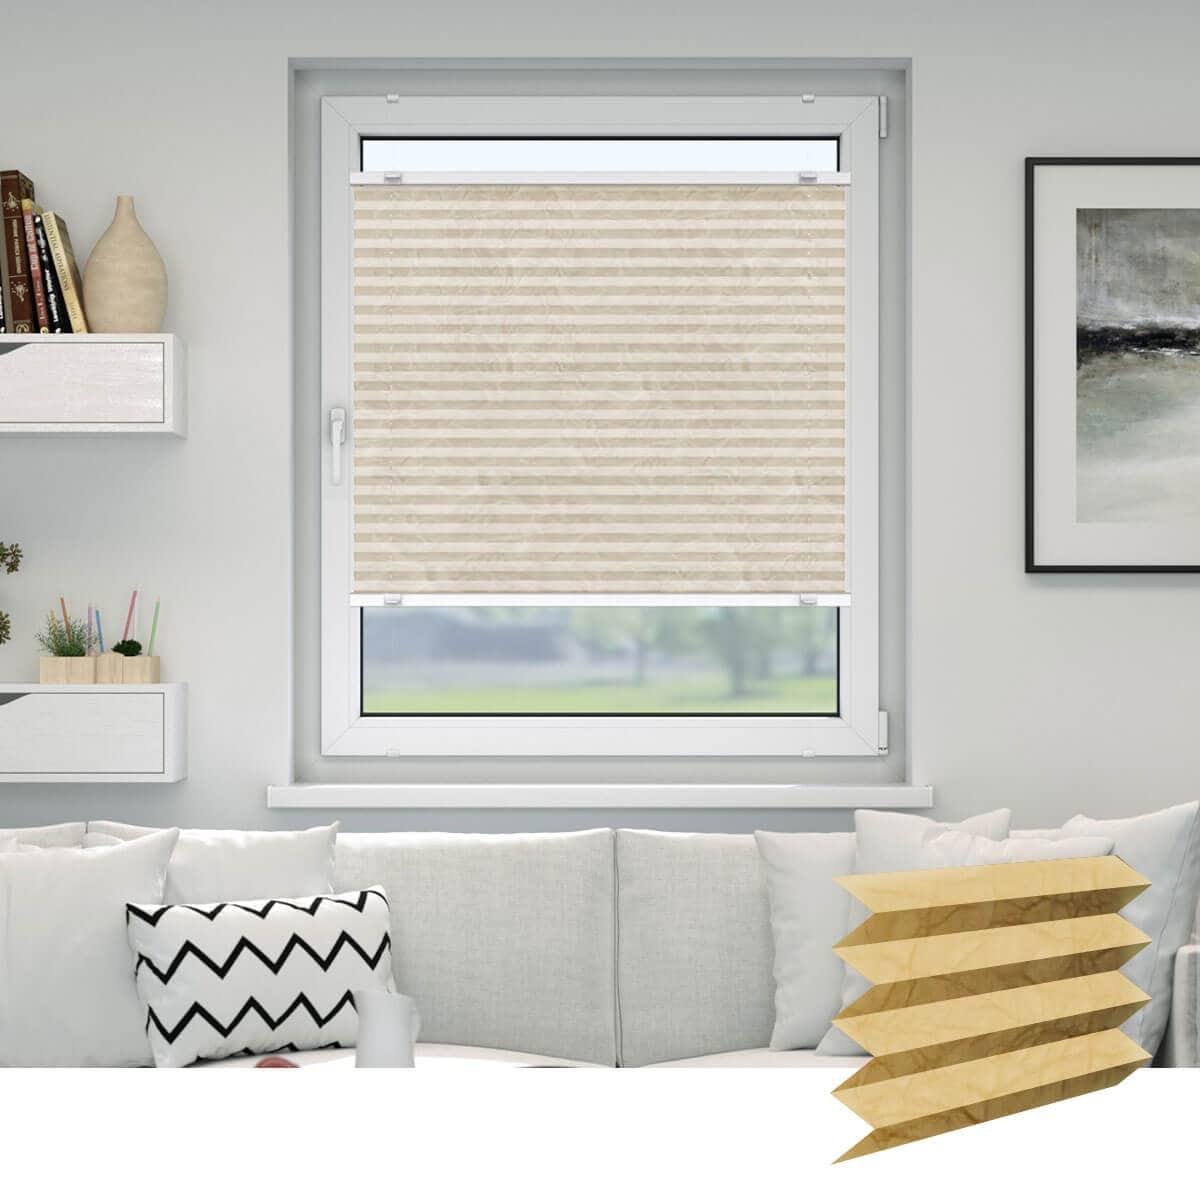 plissee nach ma stoffe form als mm ma anfertigung. Black Bedroom Furniture Sets. Home Design Ideas